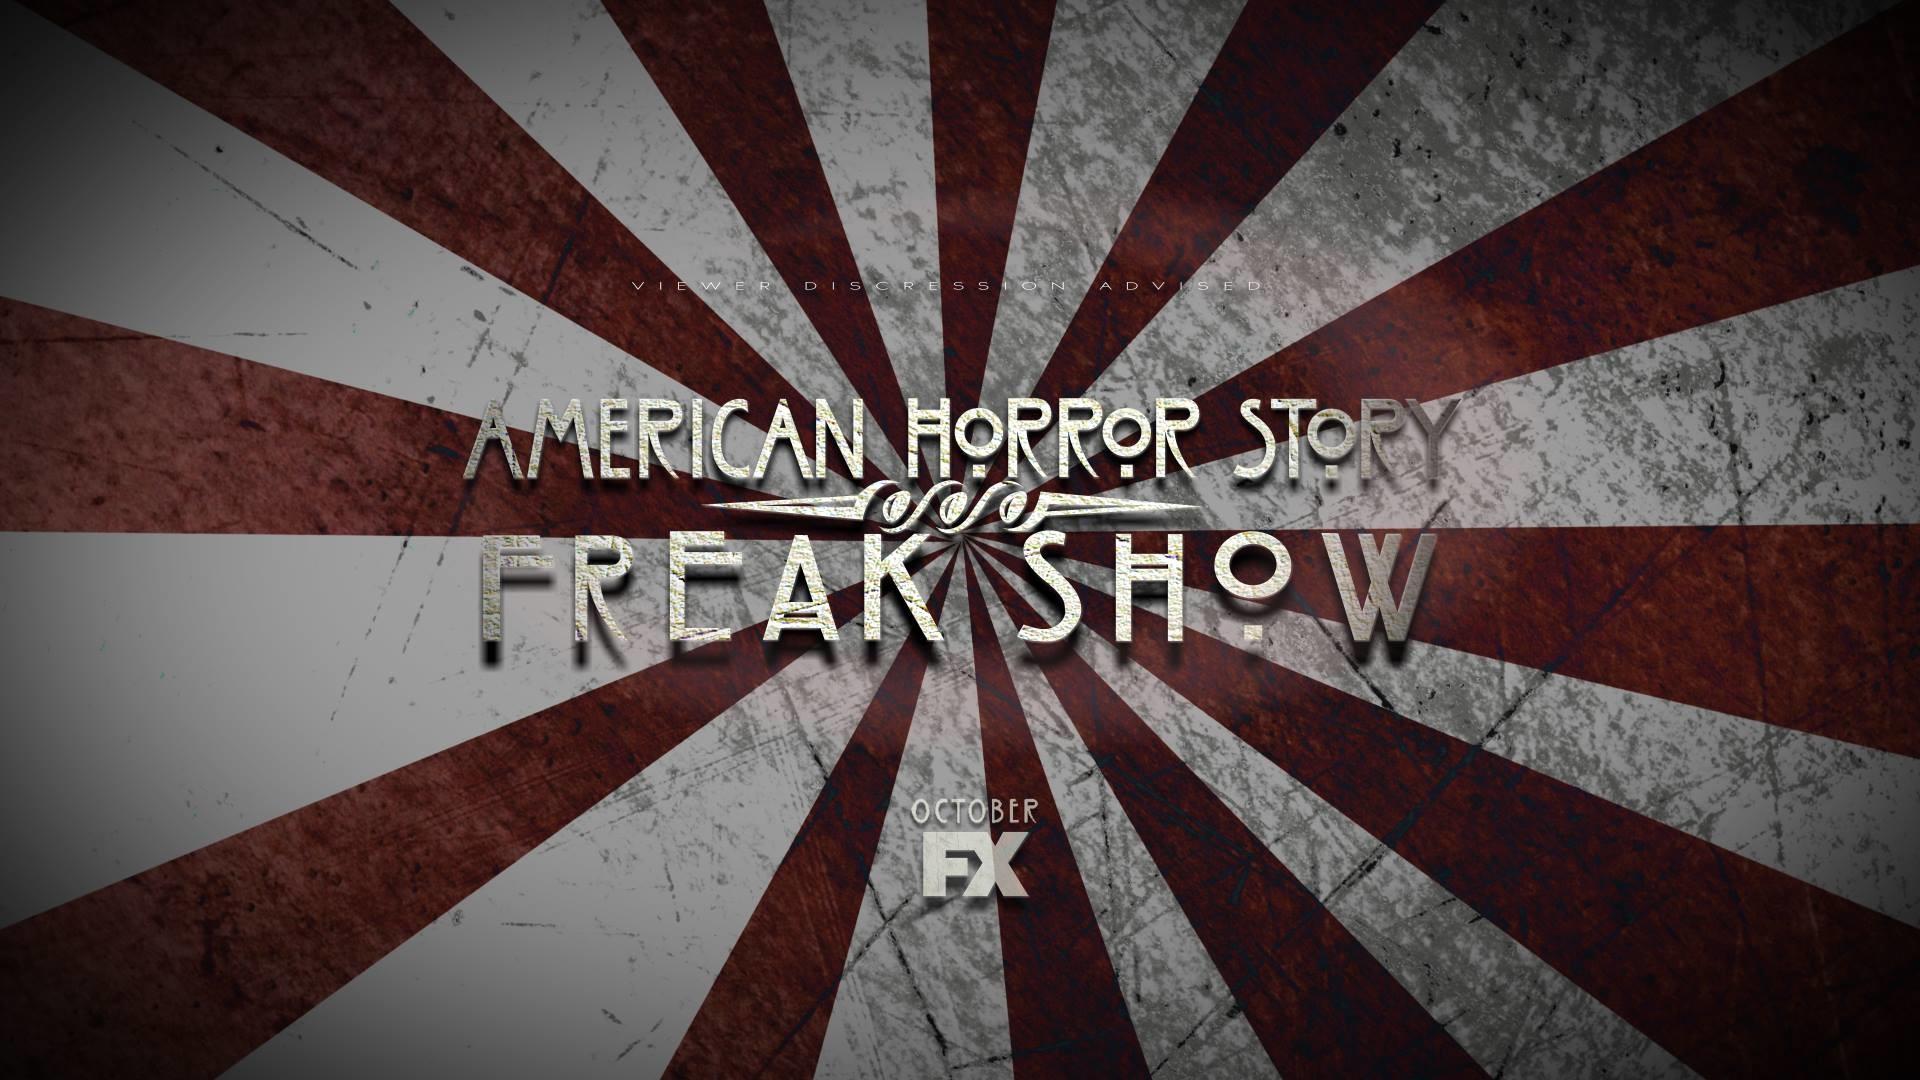 American Horror Story Freak Show Title Card